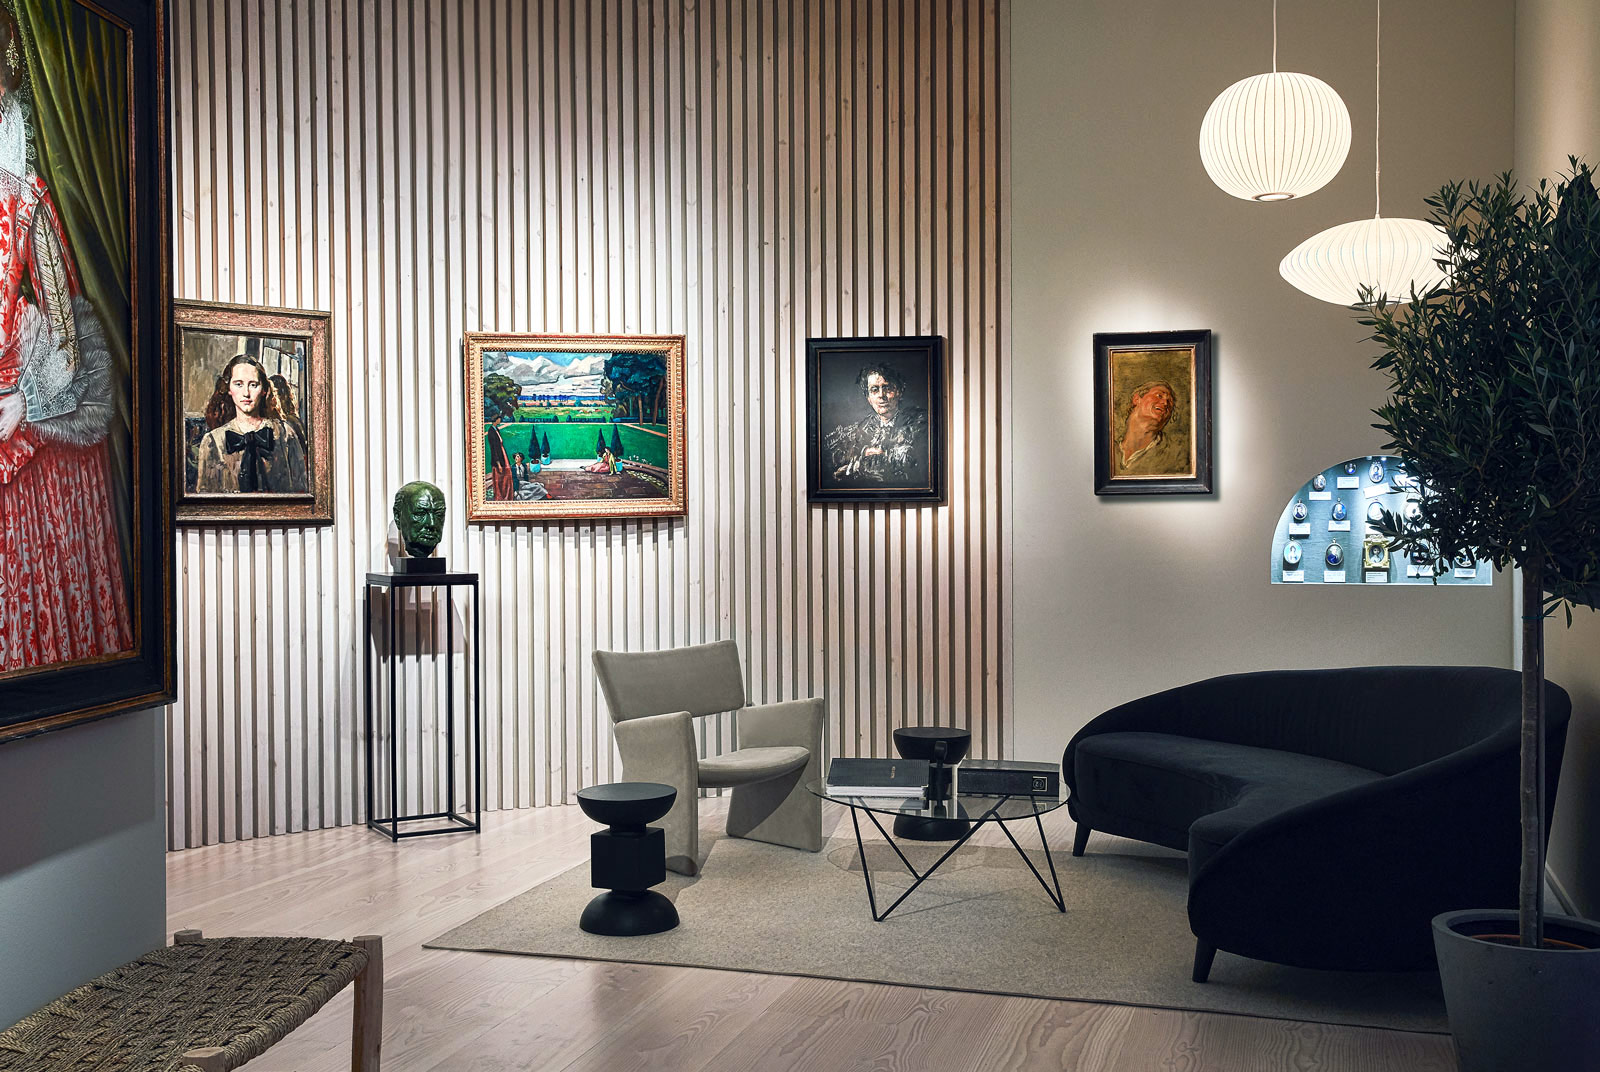 House_of_Grey_Exhibition_Design_Masterpiece_gallery.jpg